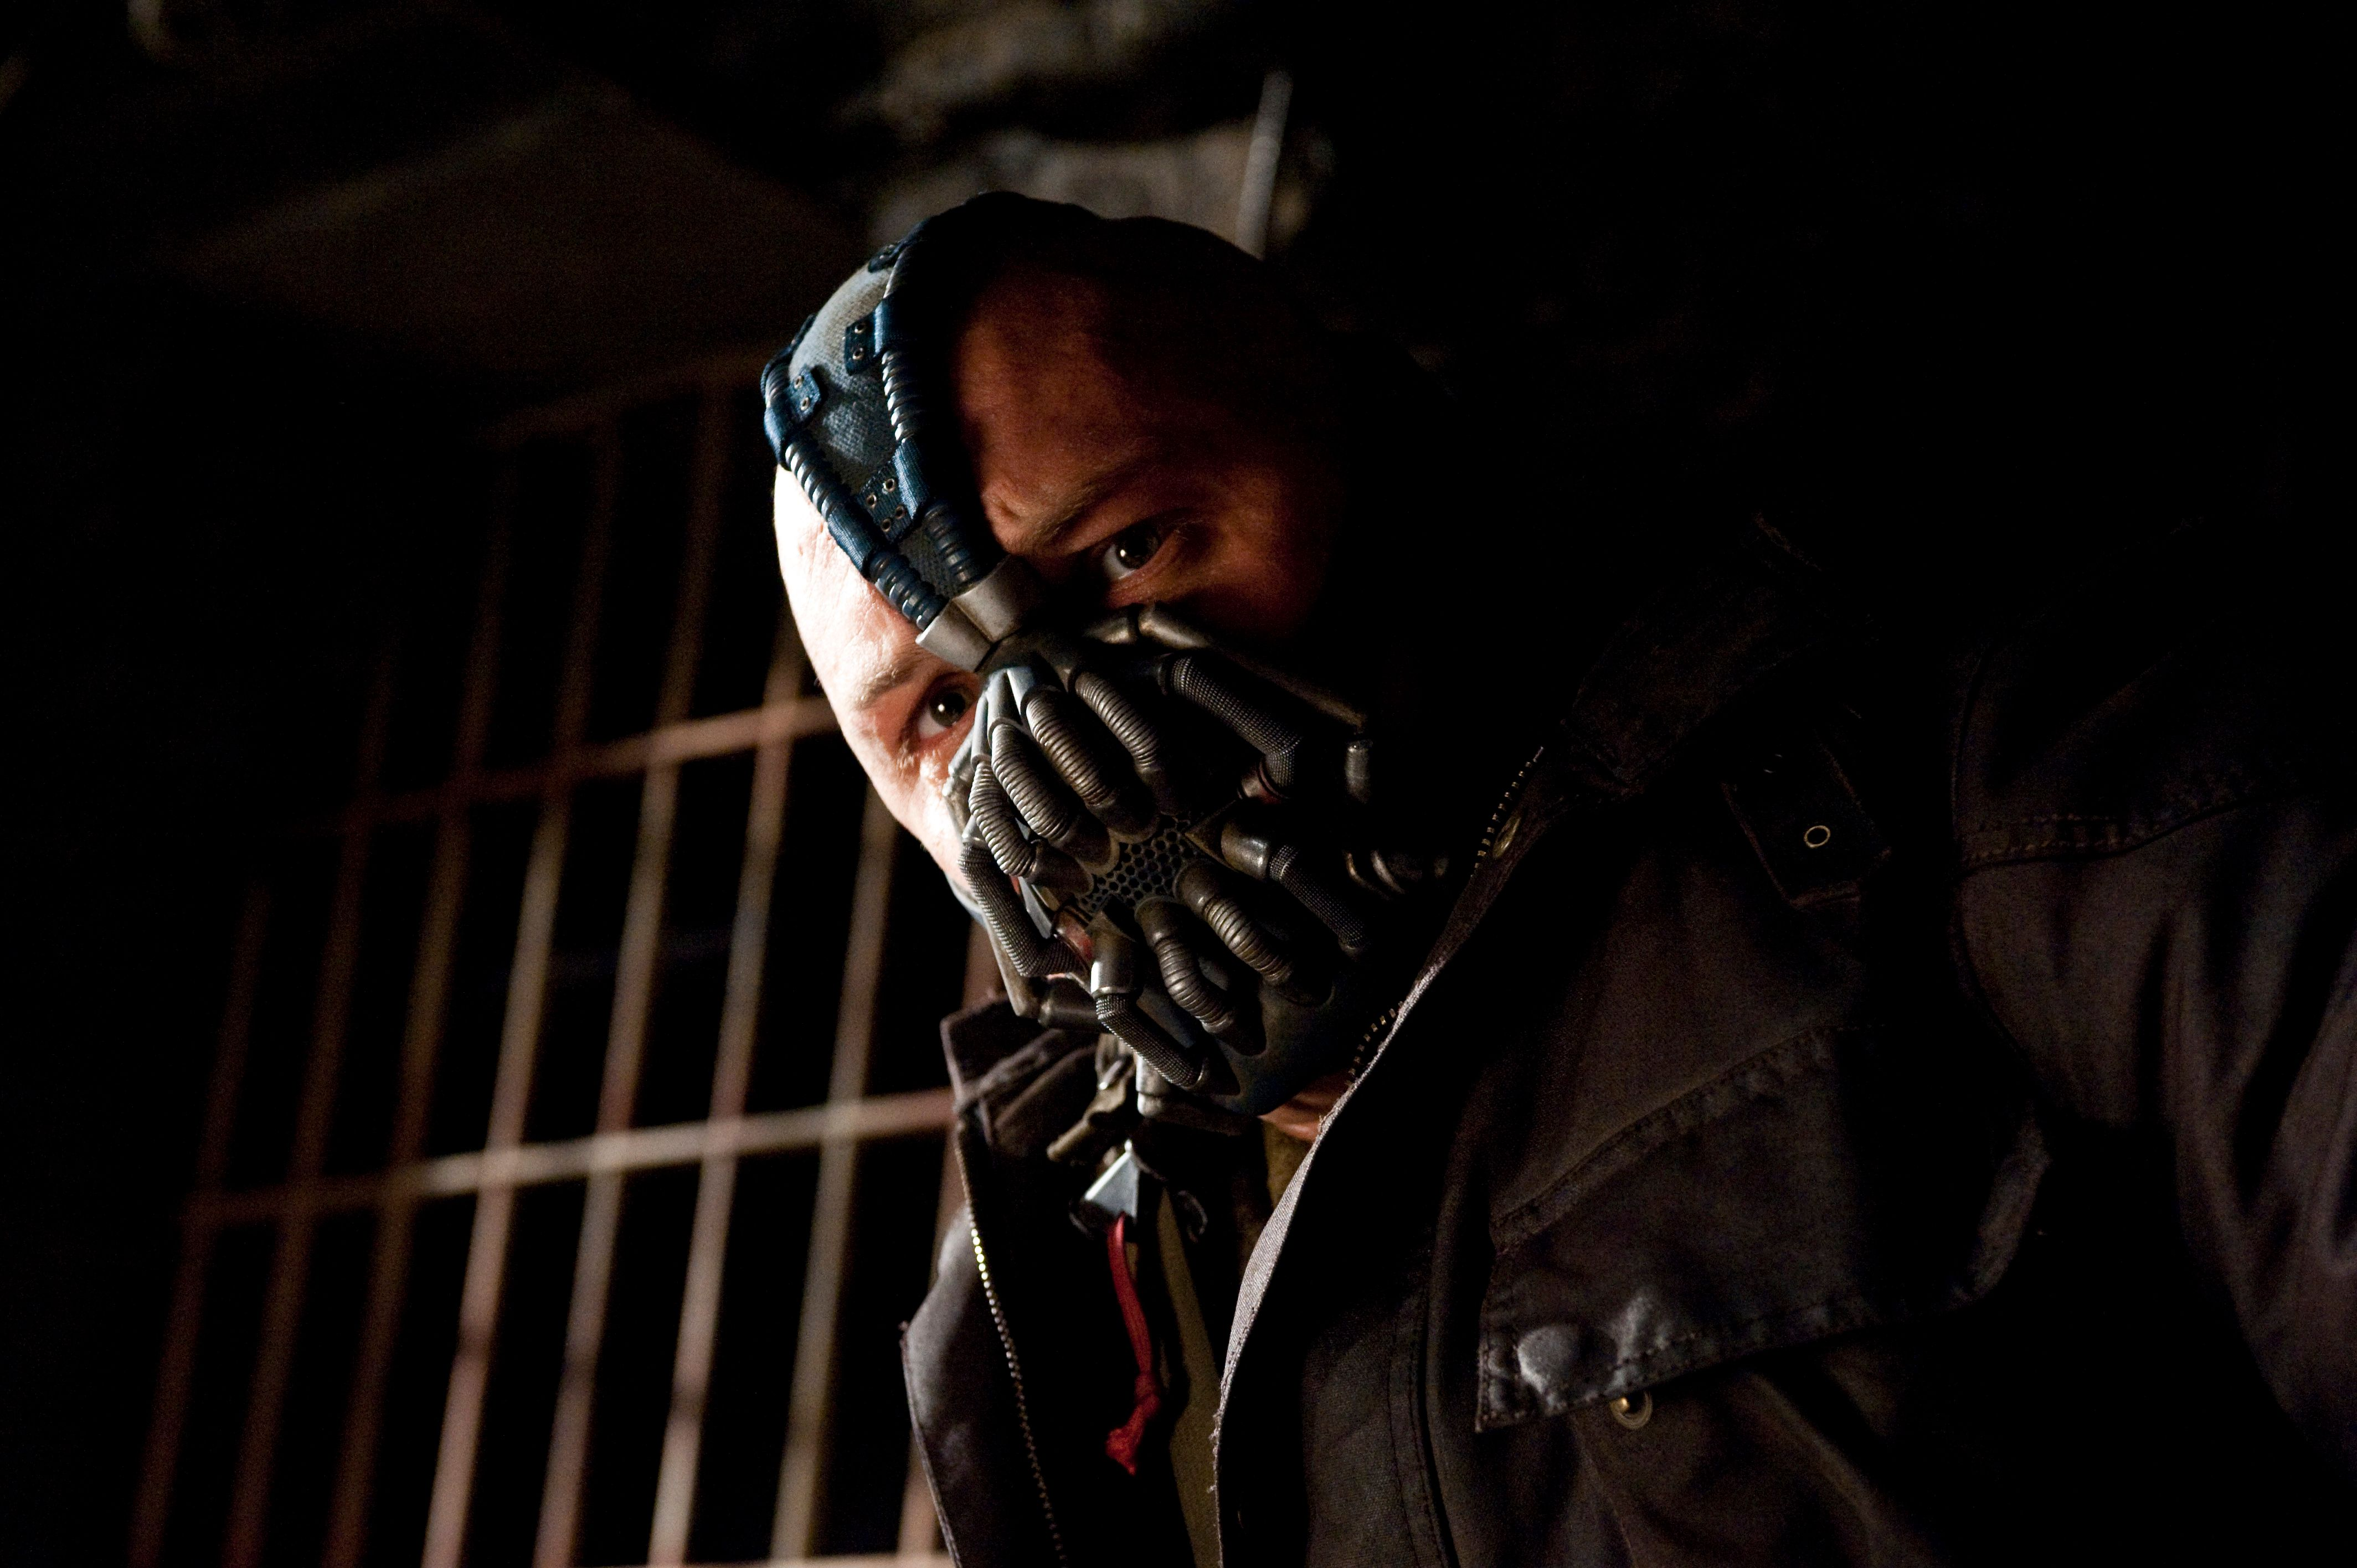 THE DARK KNIGHT RISES Images Bane, Batman, Catwoman | Collider  THE DARK KNIGHT...